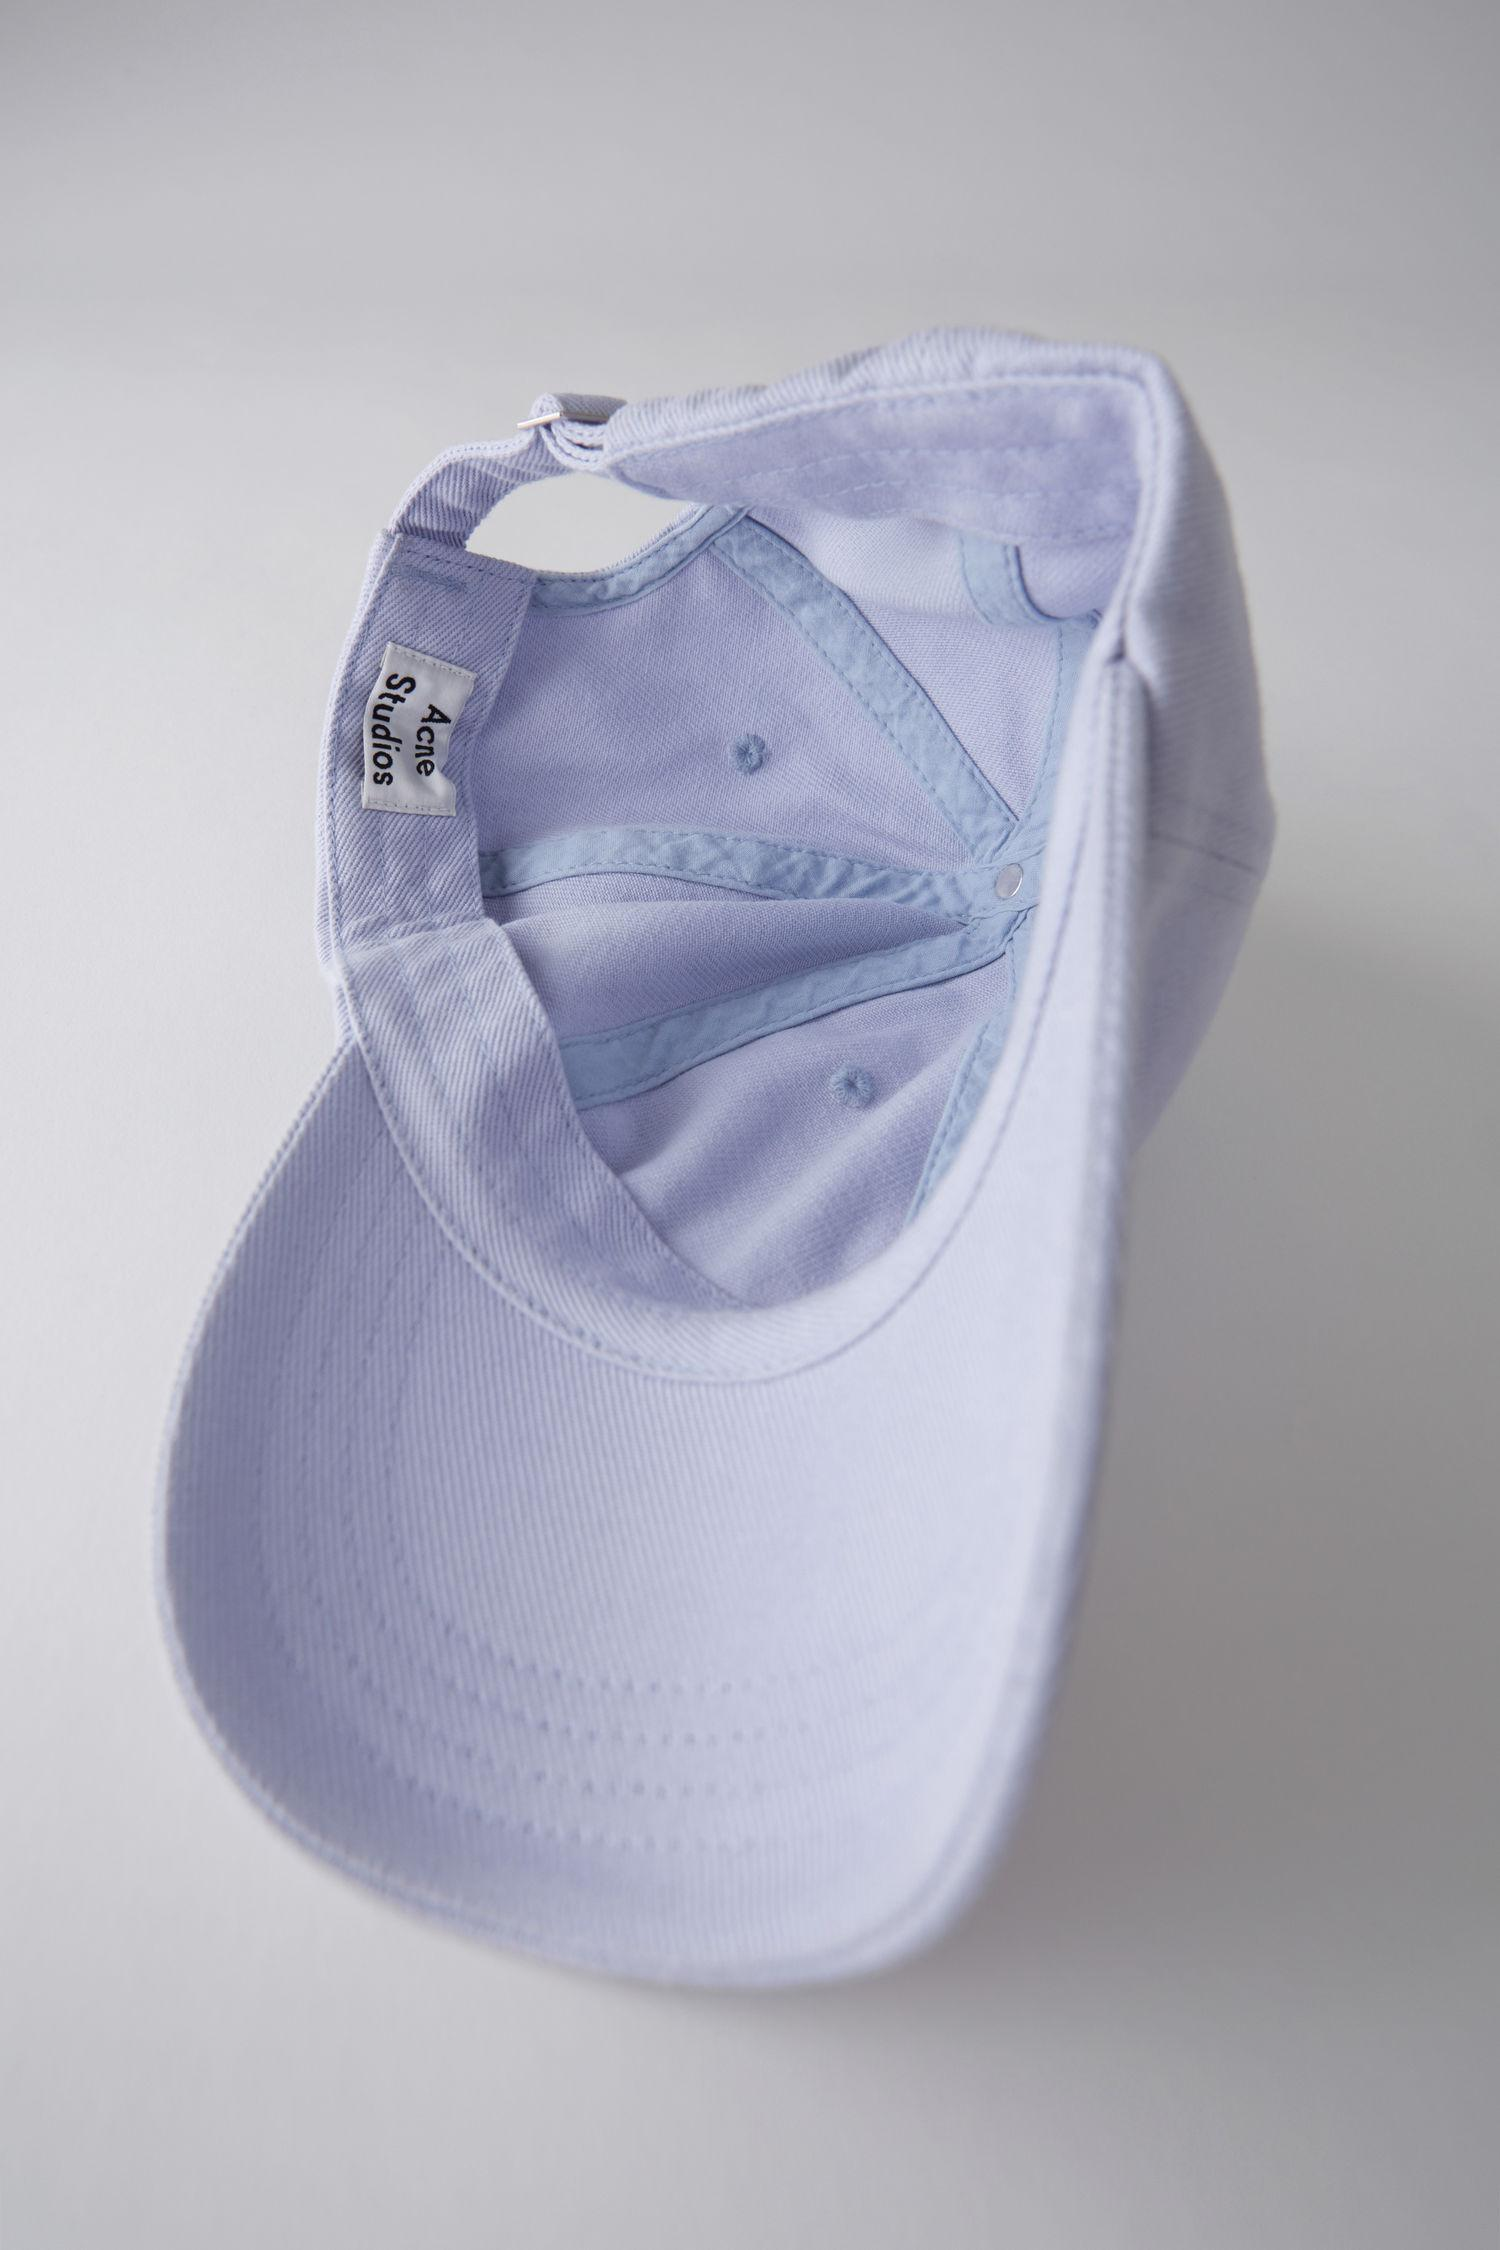 3cff51d77de Acne Studios Baseball Cap lilac in Purple for Men - Lyst